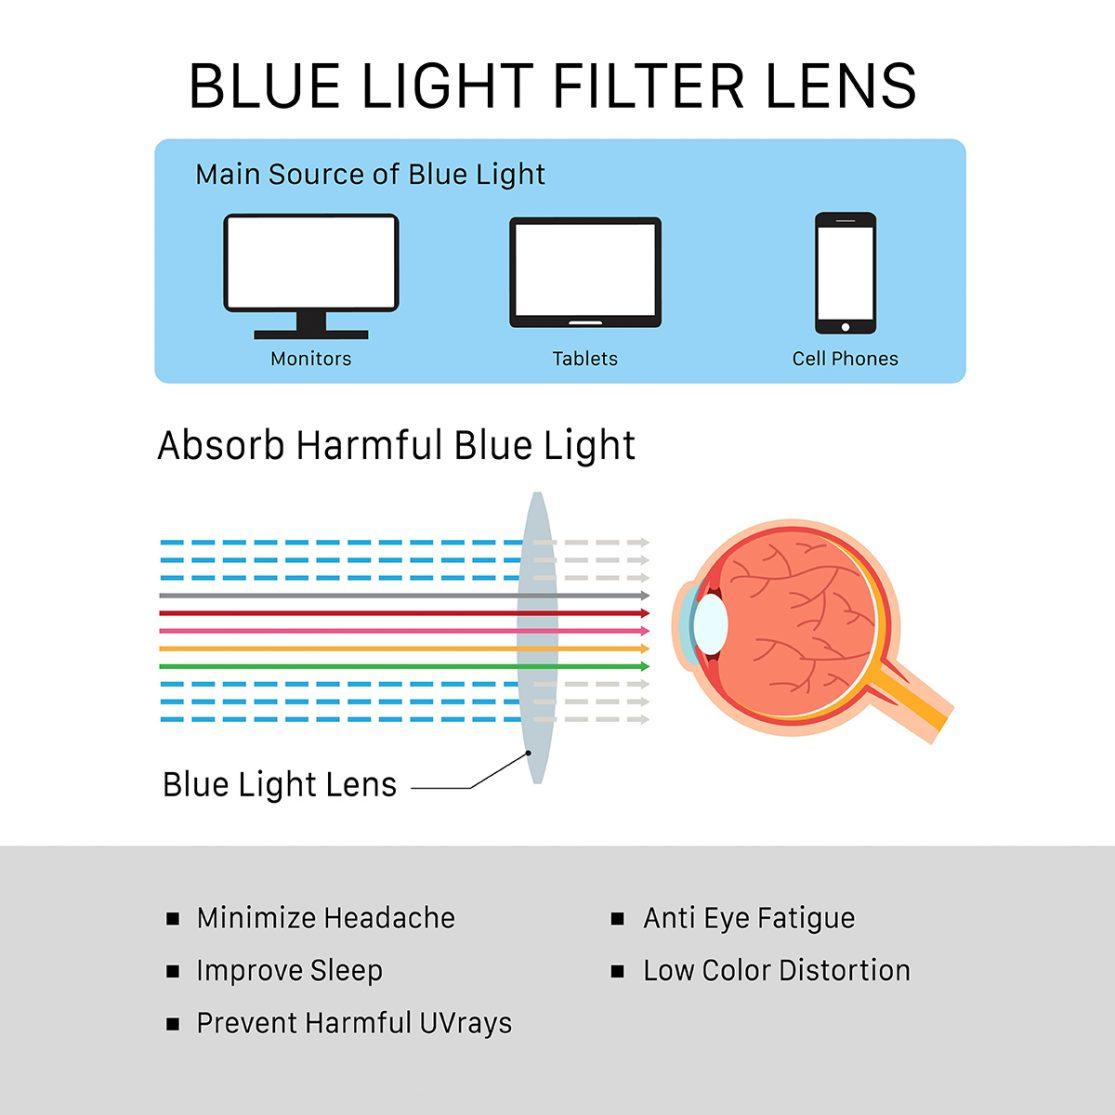 Benefits of blue light filter lens